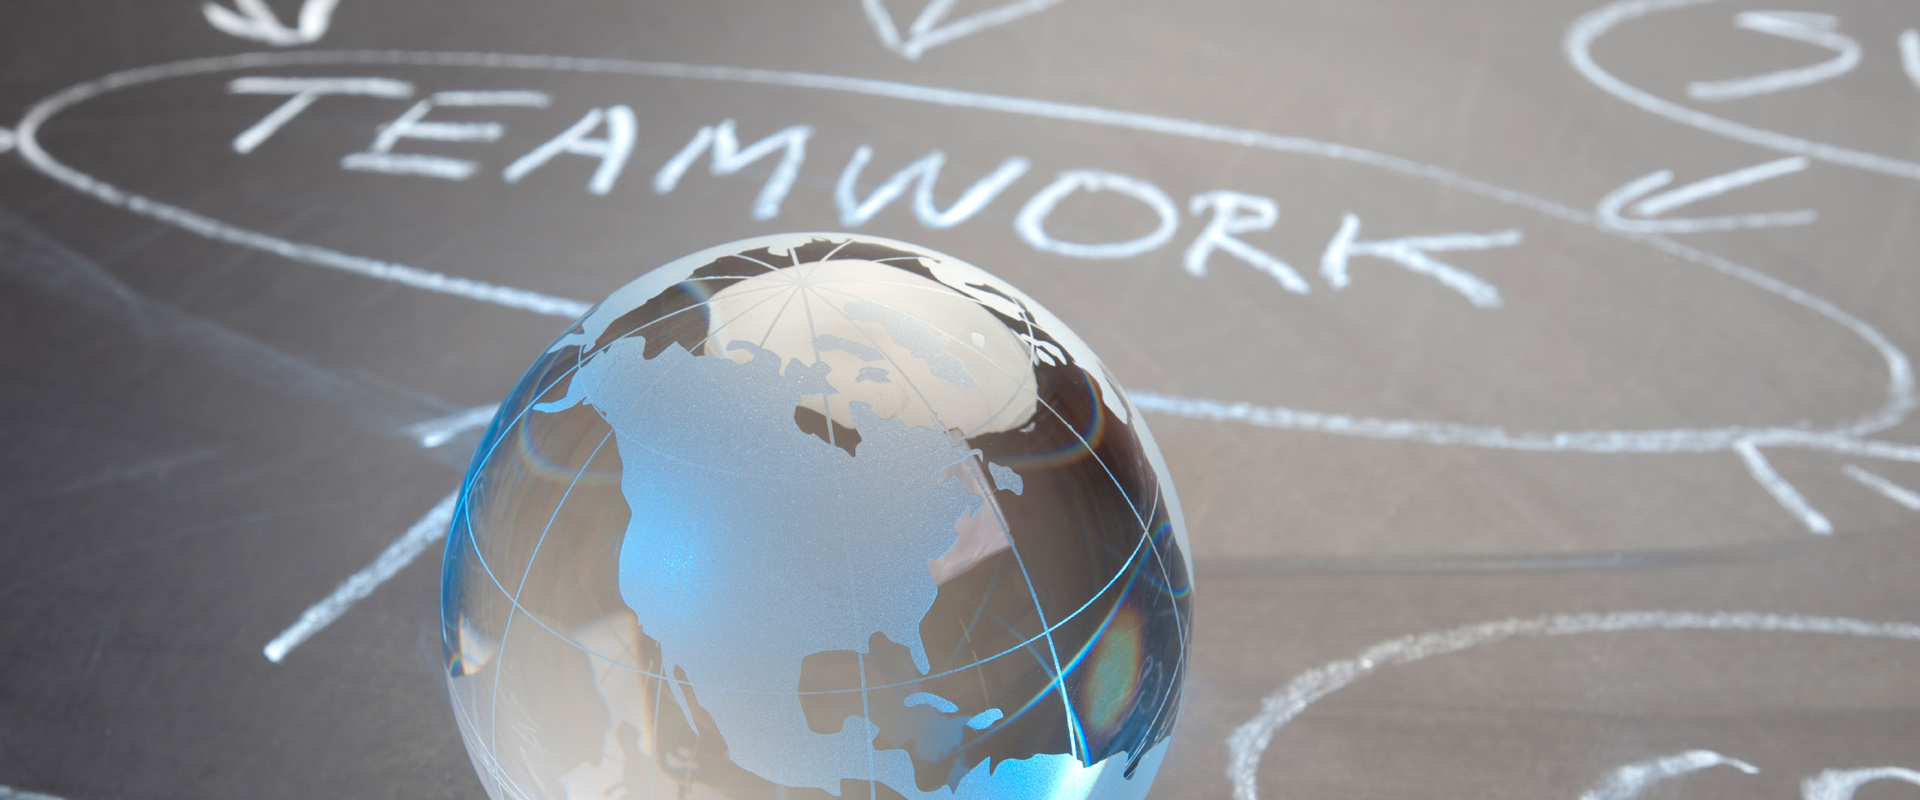 Roamingwise Worldwide teamwork